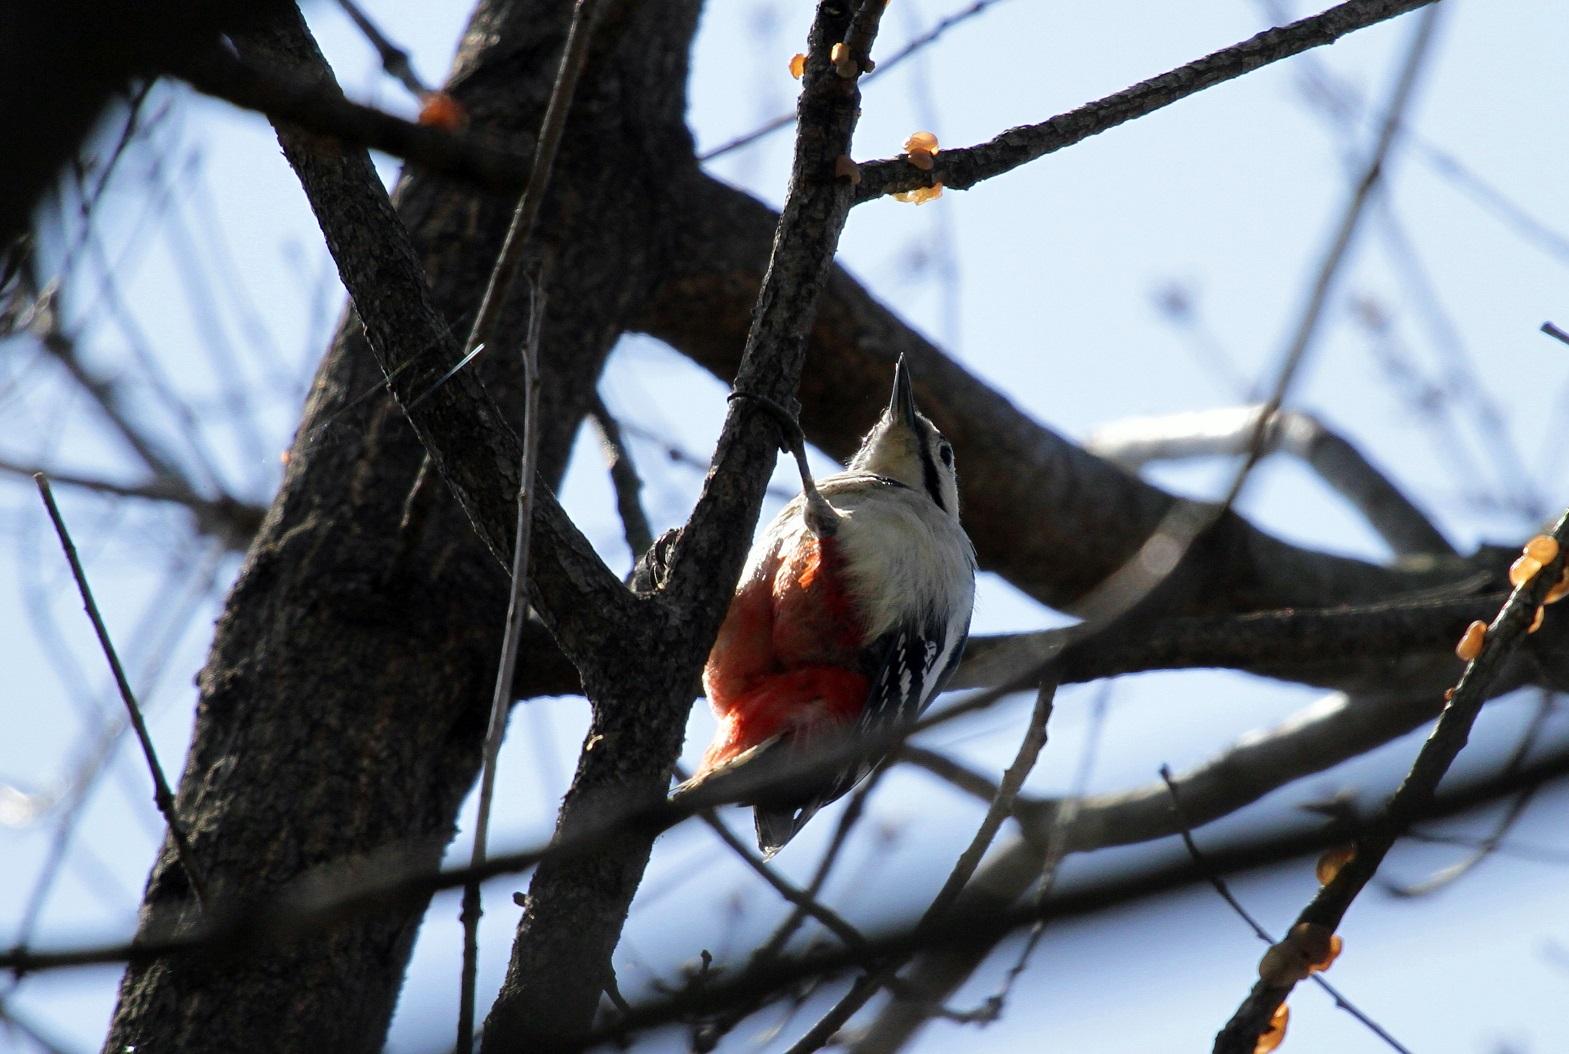 MFを鳥撮り散歩_f0239515_1971670.jpg